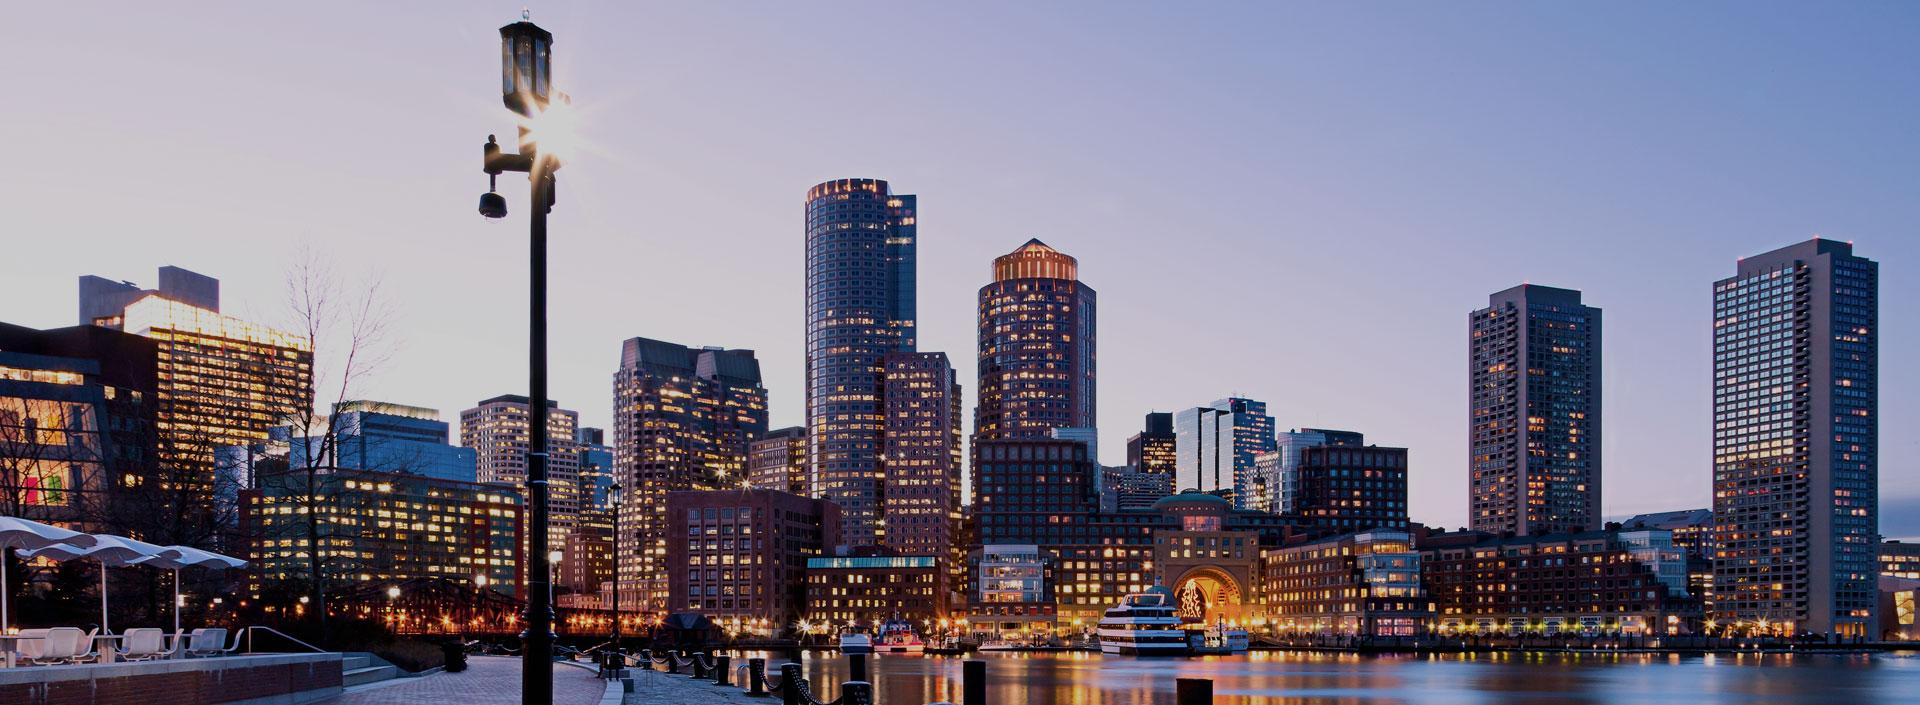 08-Boston1